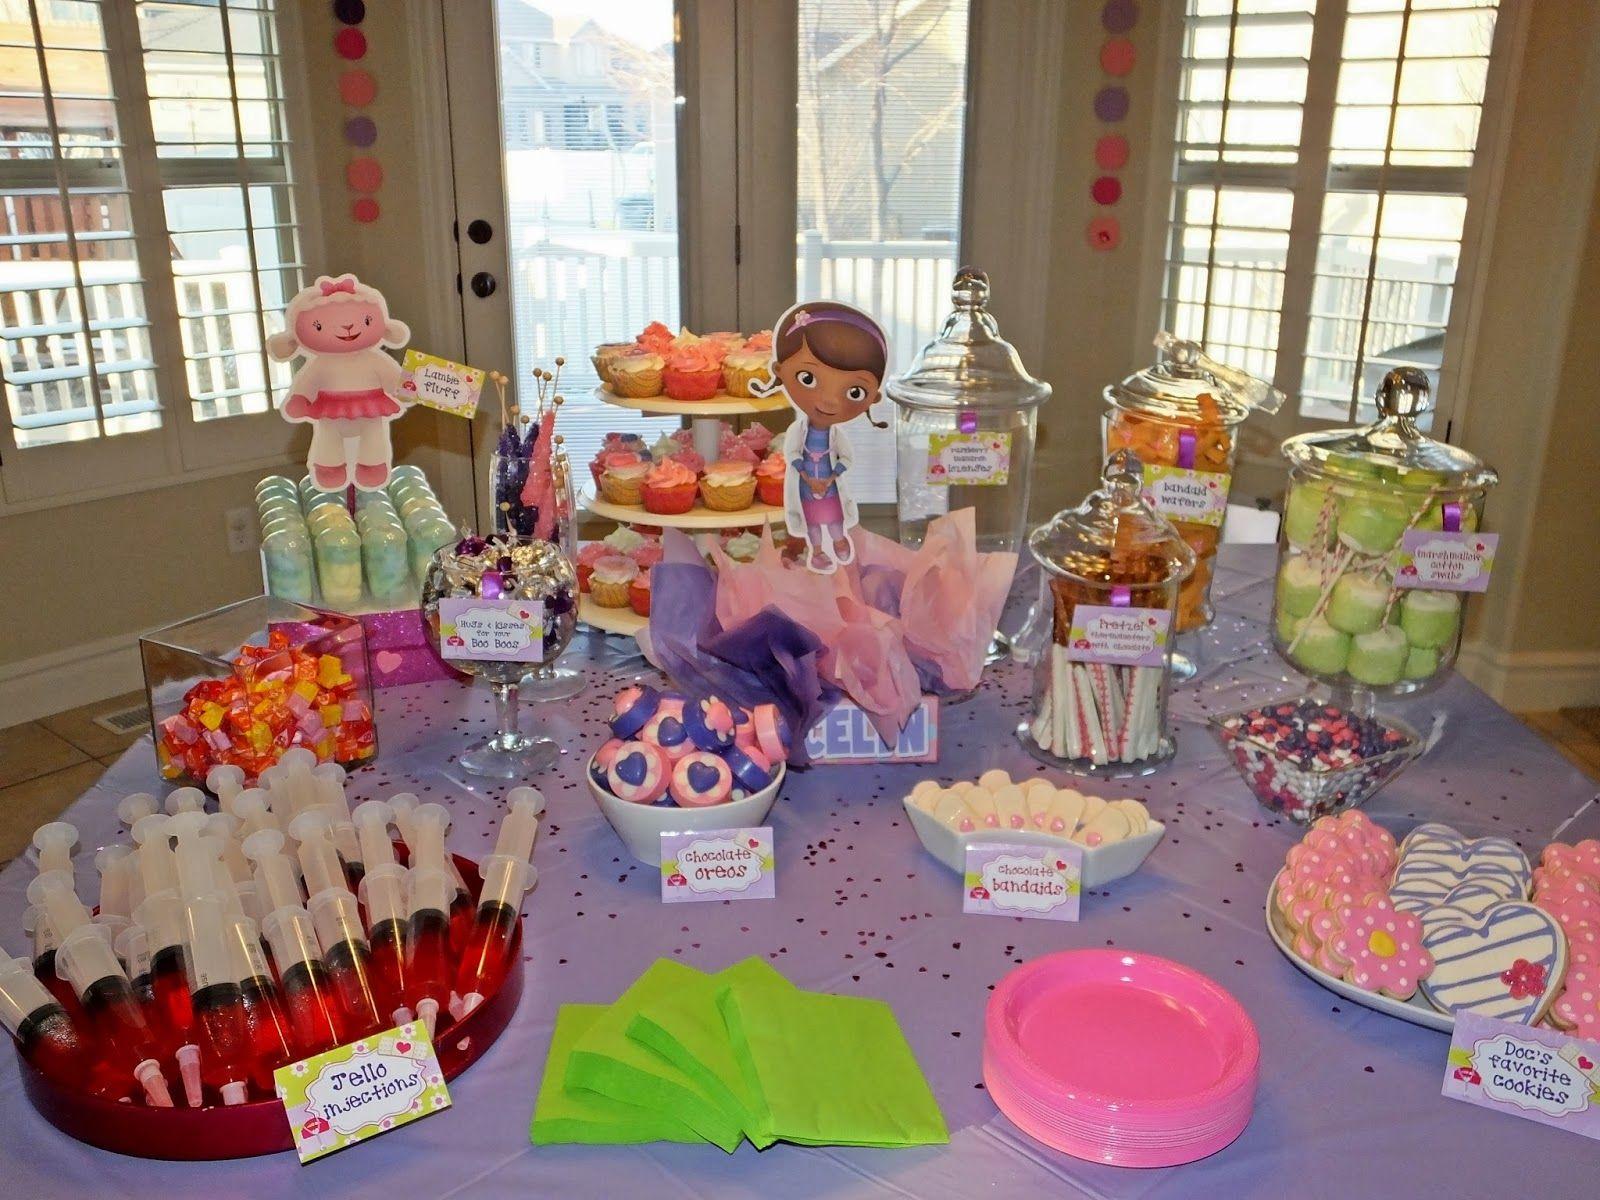 Doc mcstuffins bandages doc mcstuffins party ideas on pinterest doc - The Doctor Themed Food Doc Mcstuffins Birthday